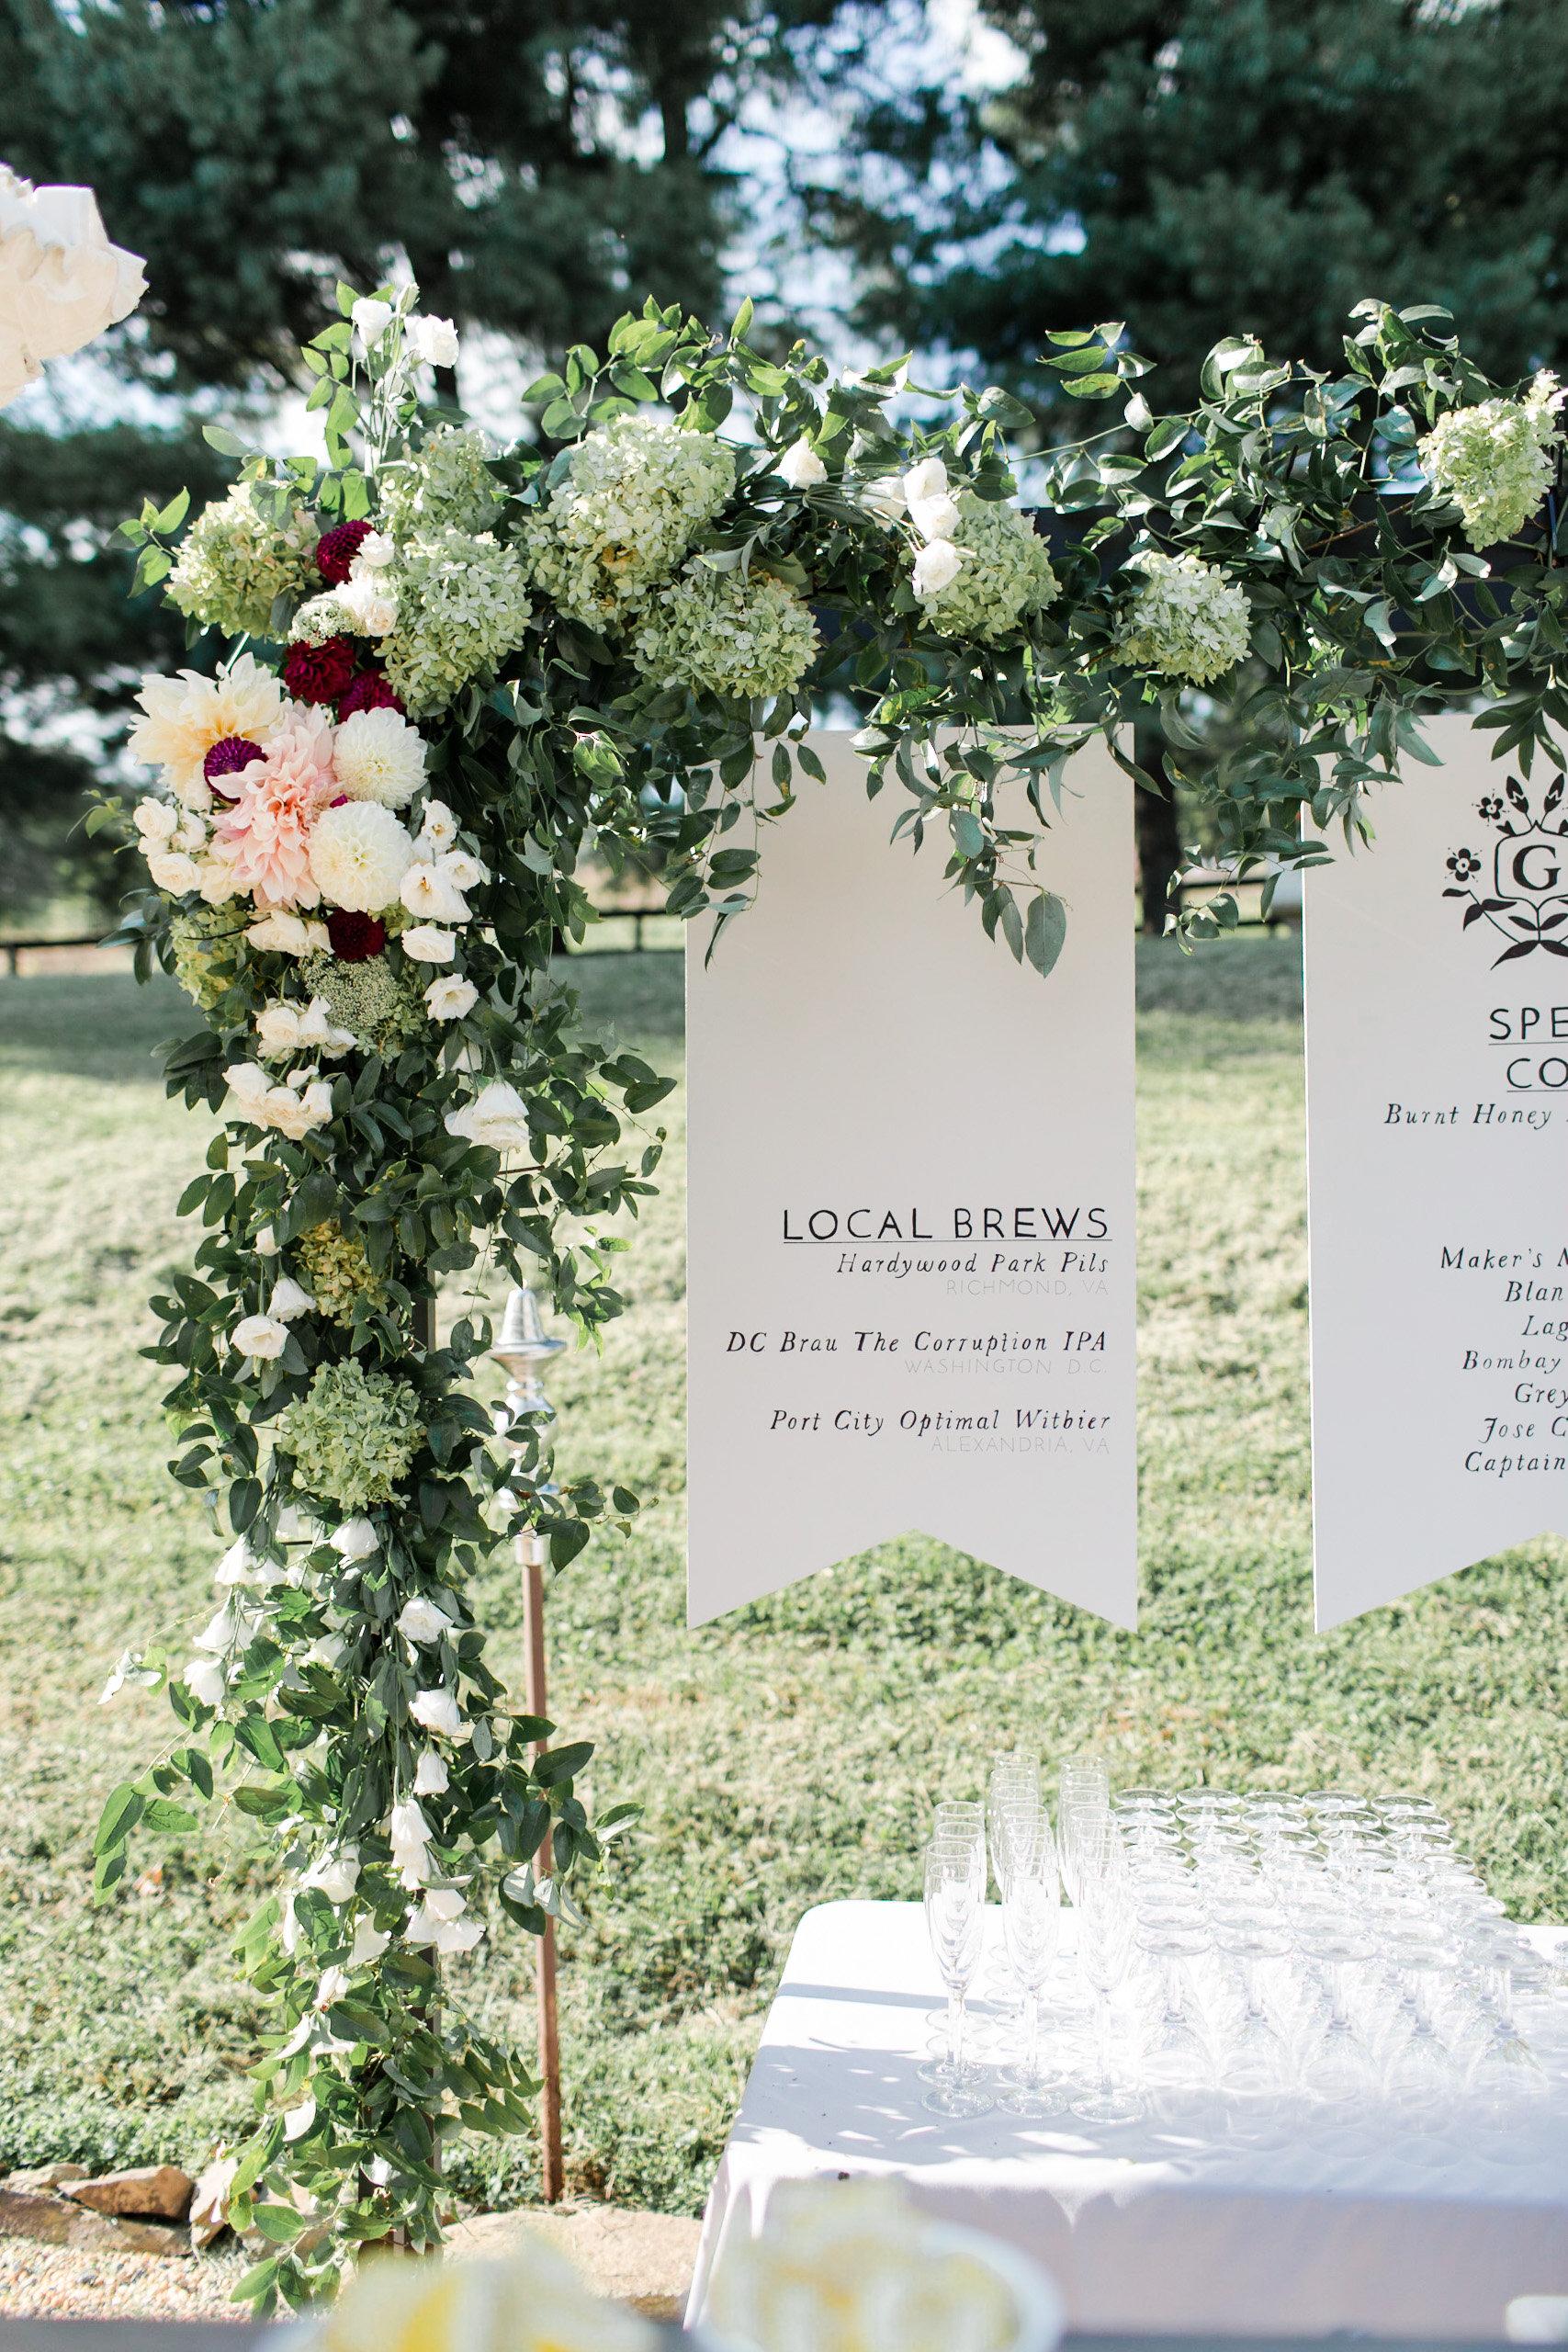 Floral Decor for Bar at wedding.jpg